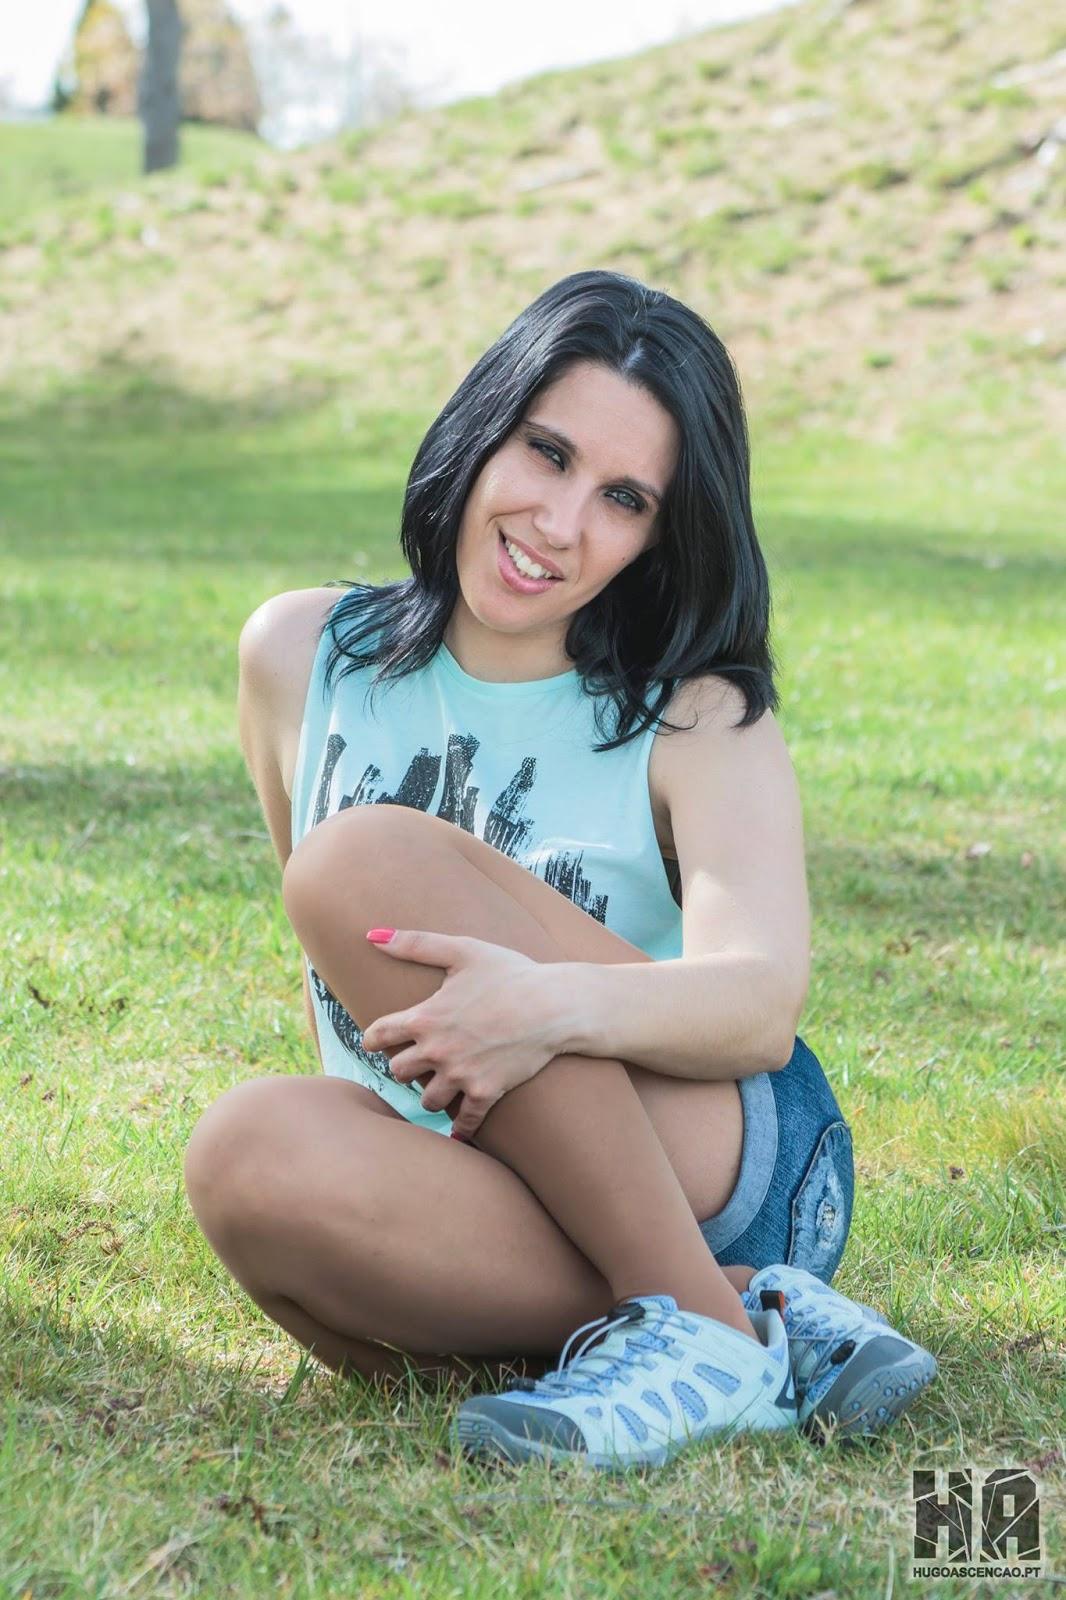 catarina single lesbian women Nuevo leon mingle2com is a 100% free dating service meet thousands of single men and women from nuevo leon for free stop.